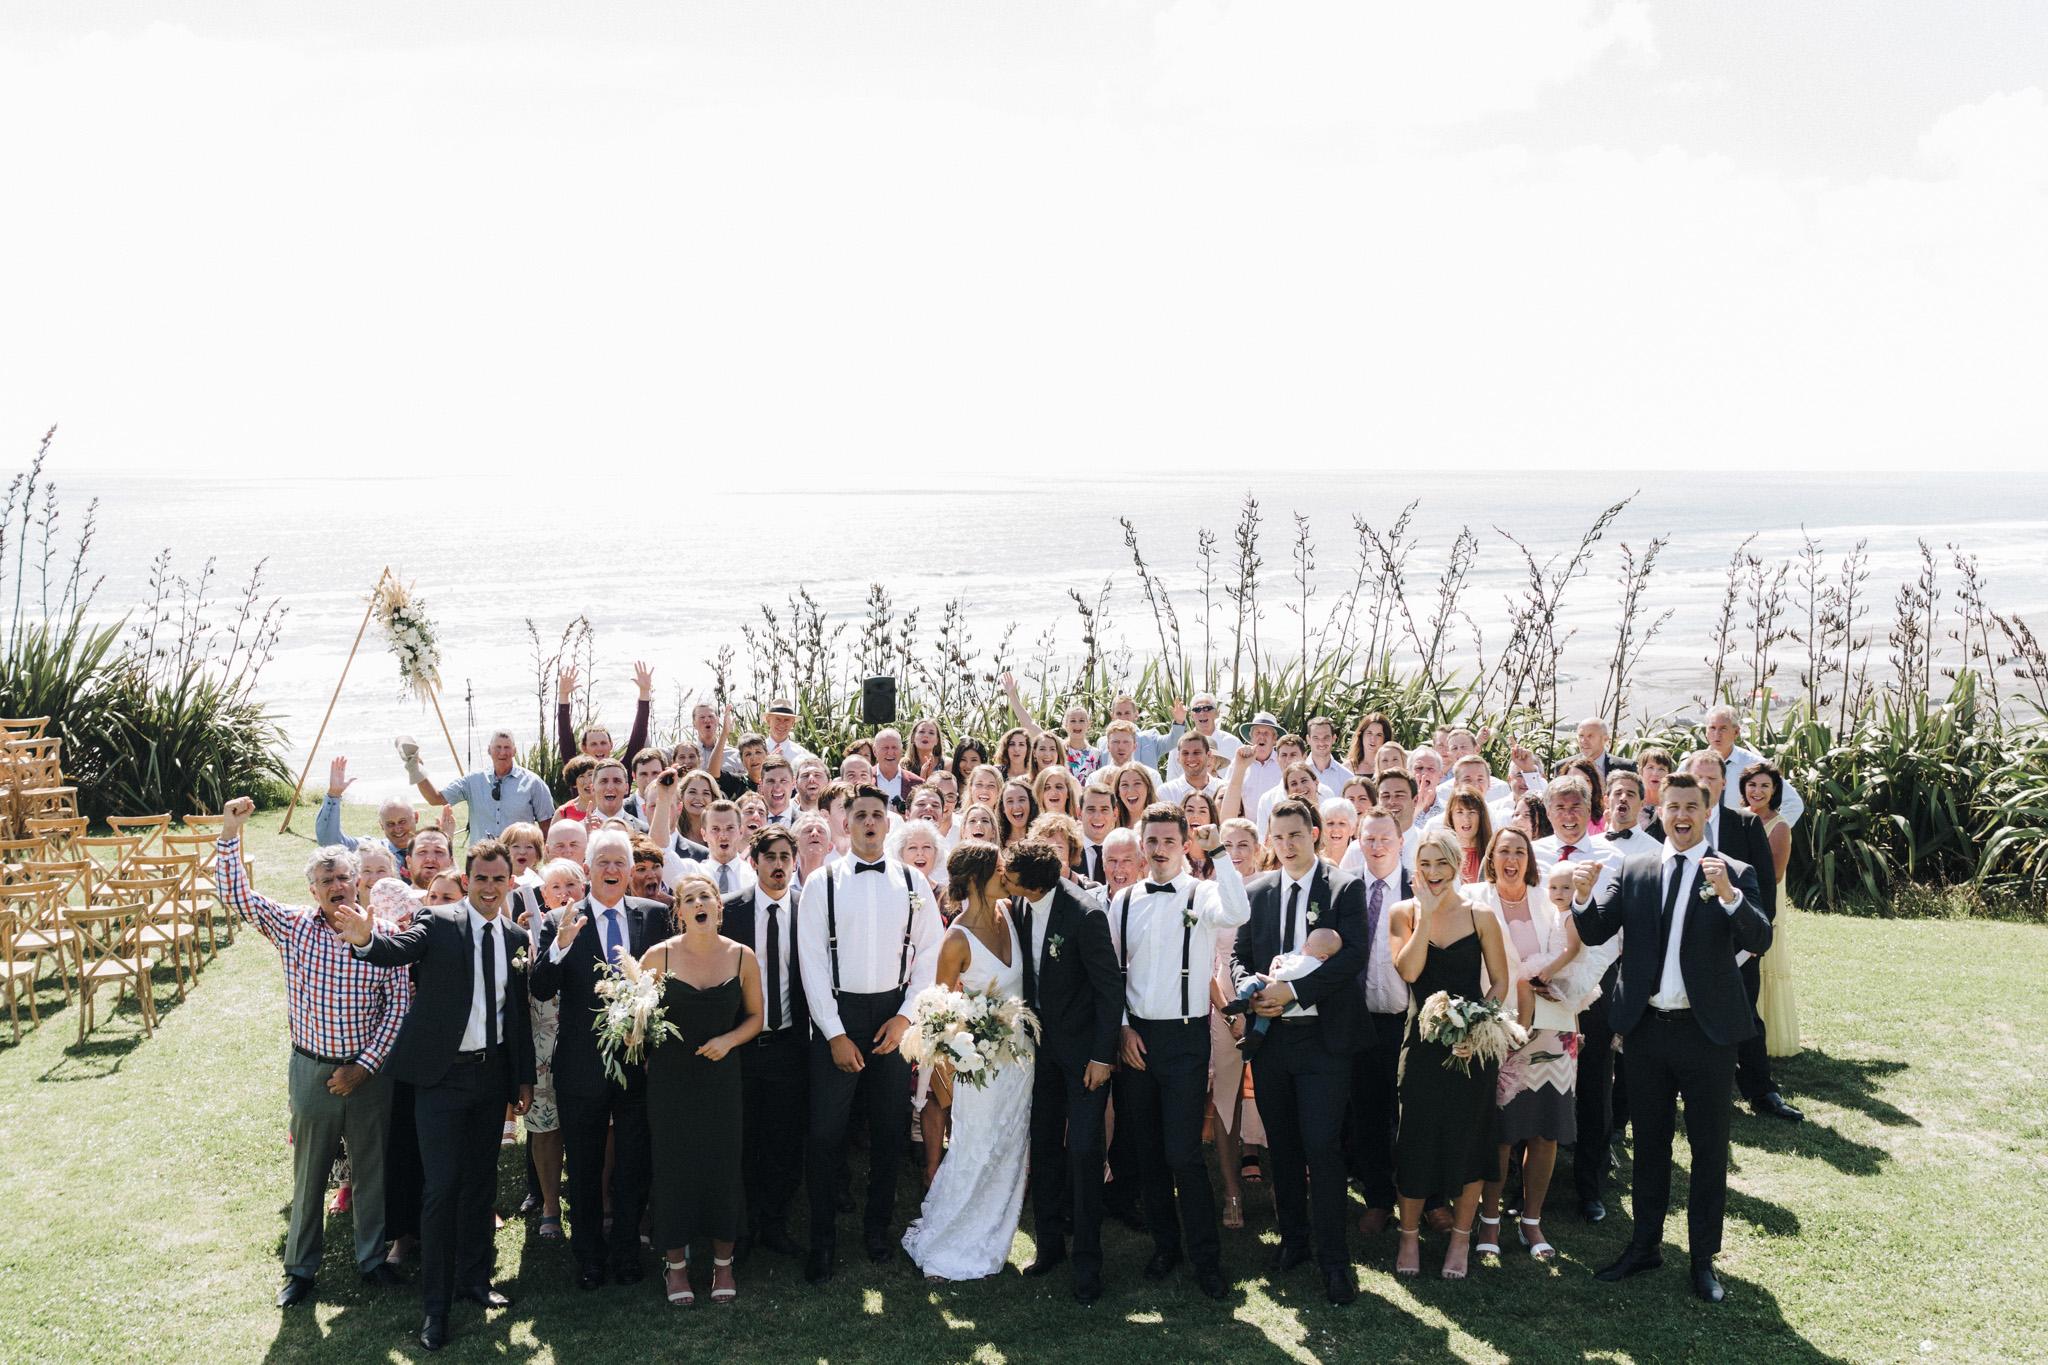 newfound-h-m-castaways-waiuku-auckland-wedding-photographer-137